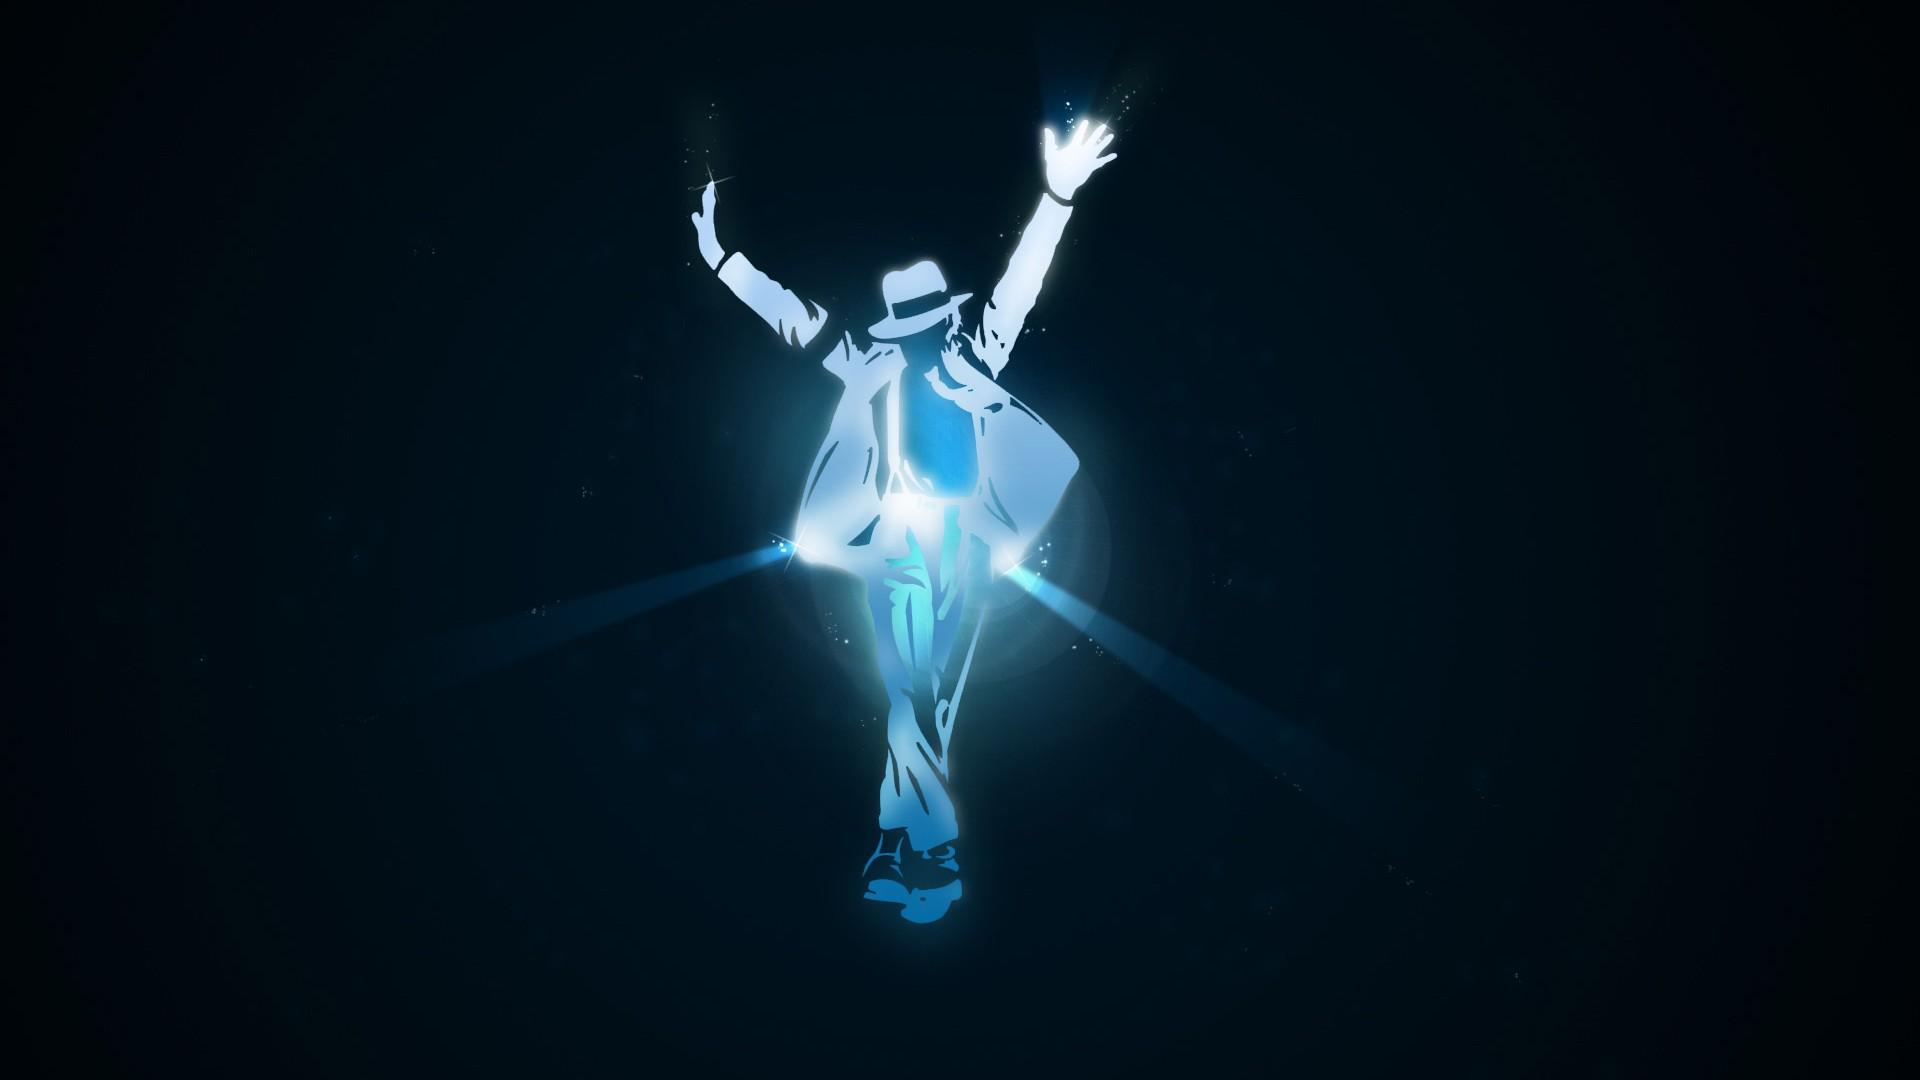 Michael Jackson Wallpapers HD blue shadow